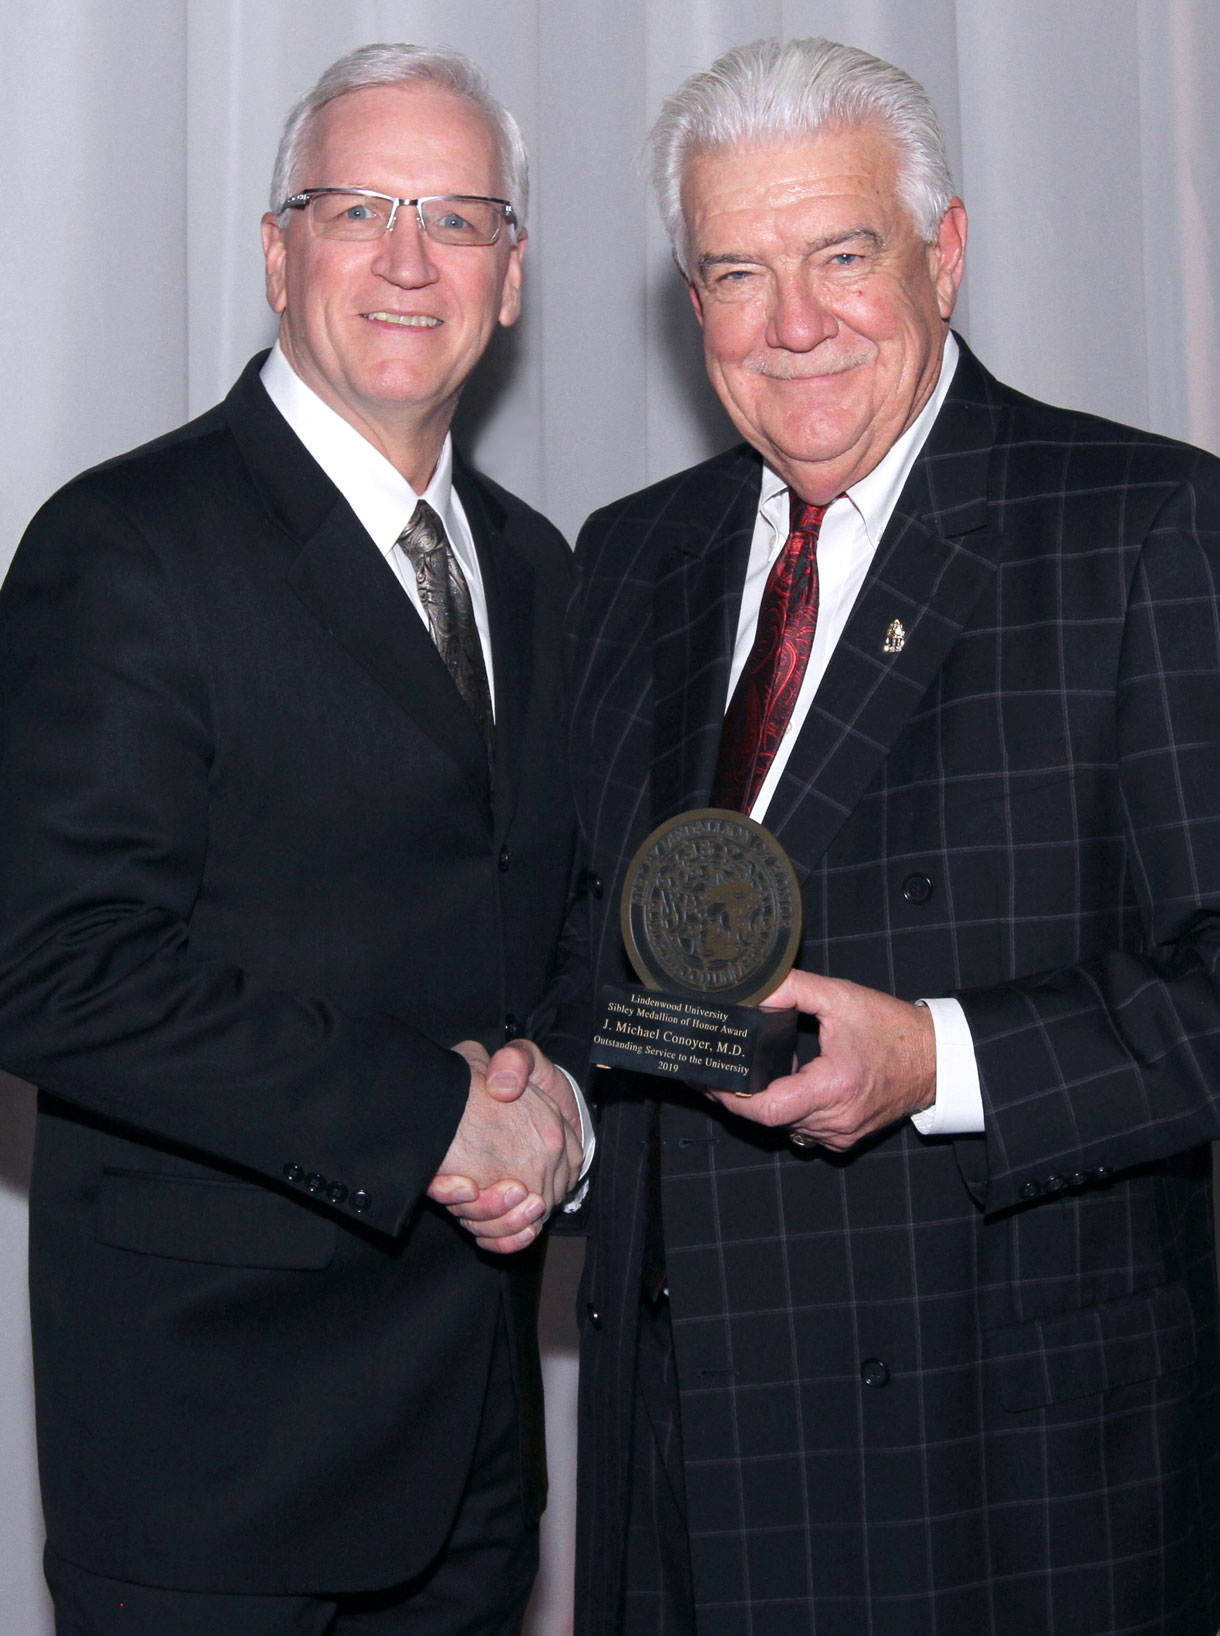 J. Michael Conoyer with President Porter